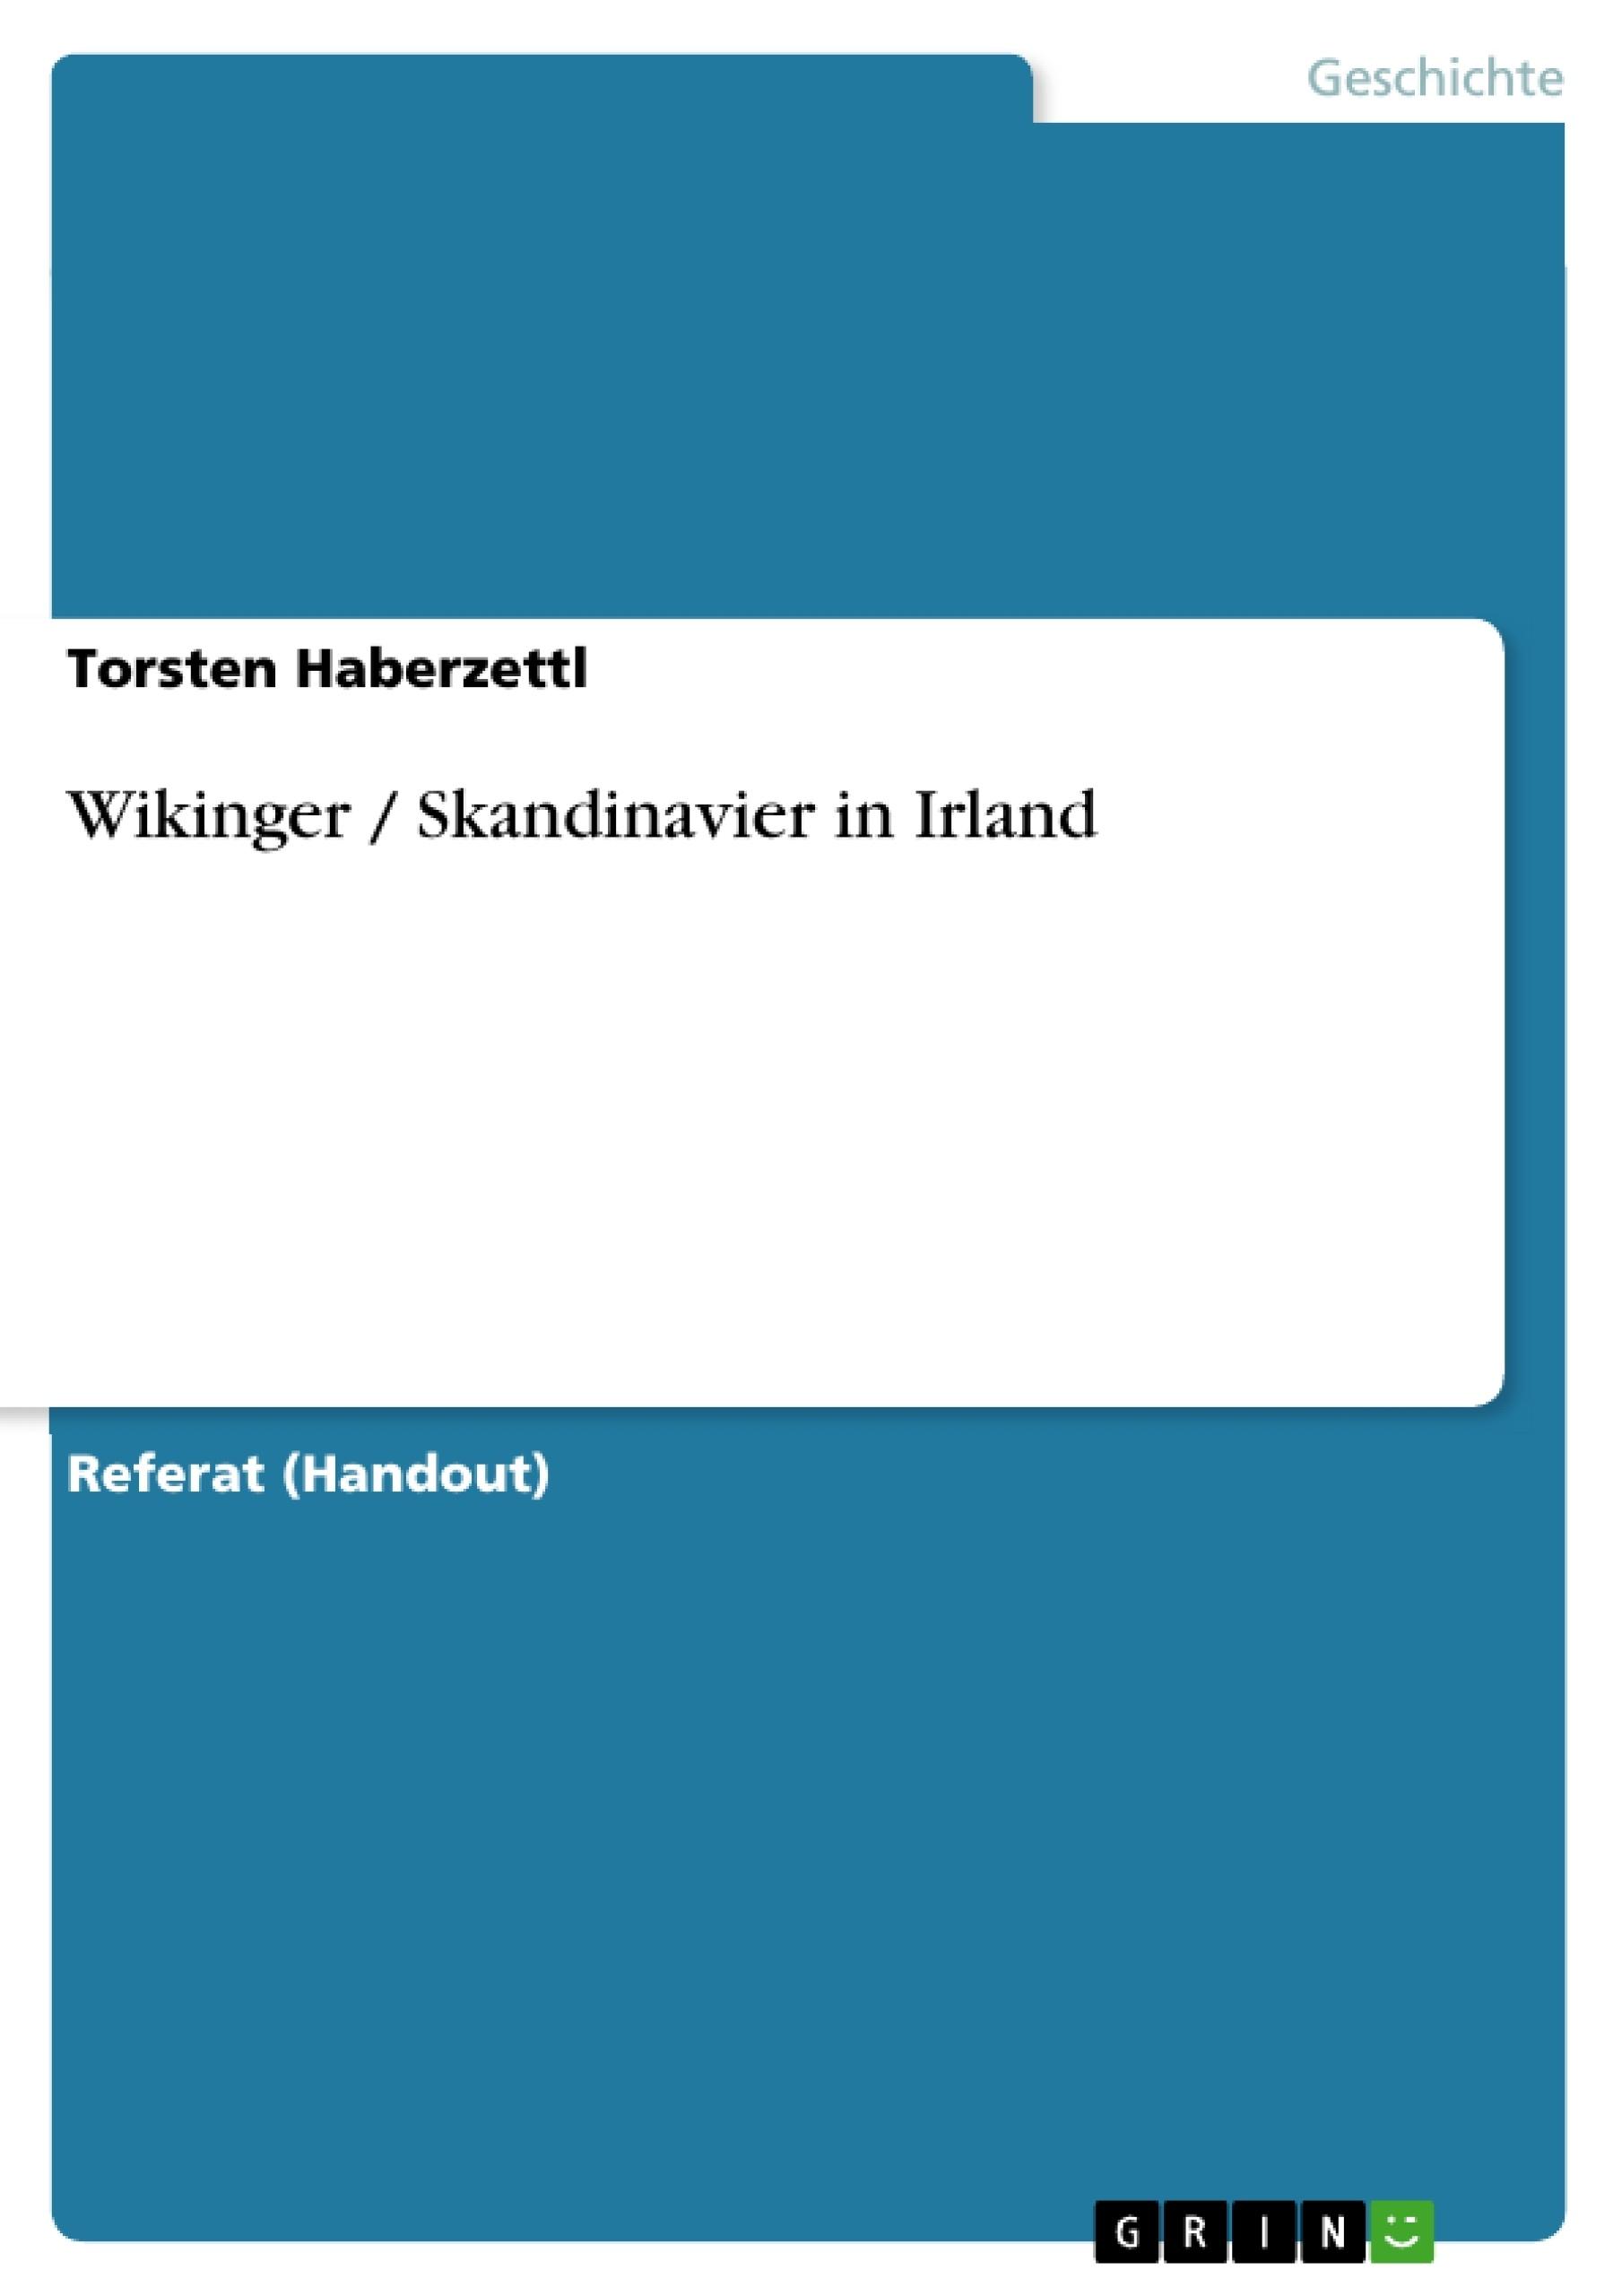 Titel: Wikinger / Skandinavier in Irland